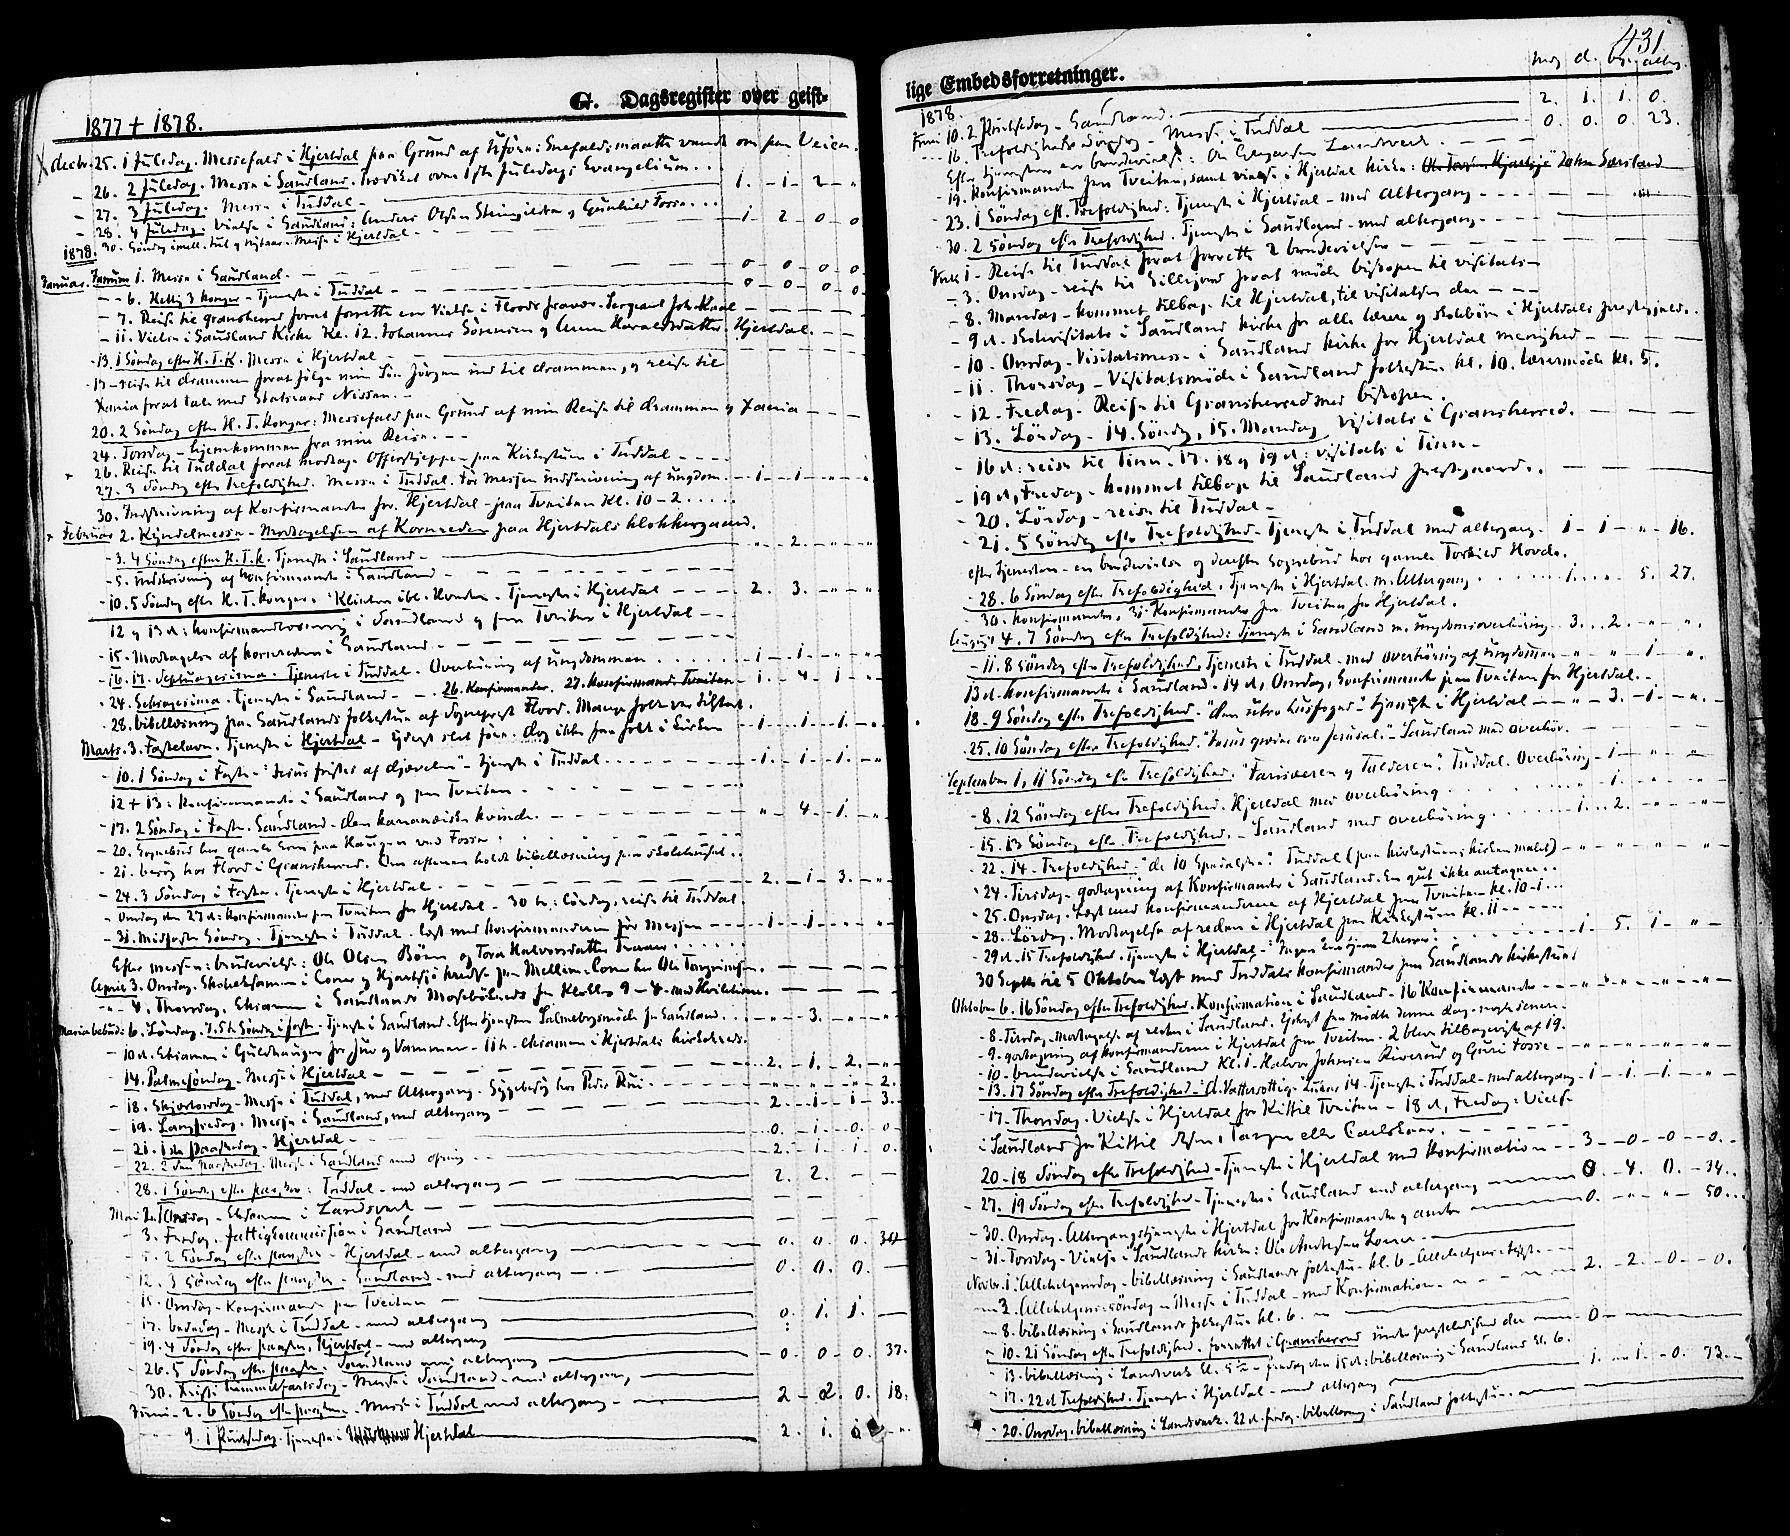 SAKO, Hjartdal kirkebøker, F/Fa/L0009: Ministerialbok nr. I 9, 1860-1879, s. 431